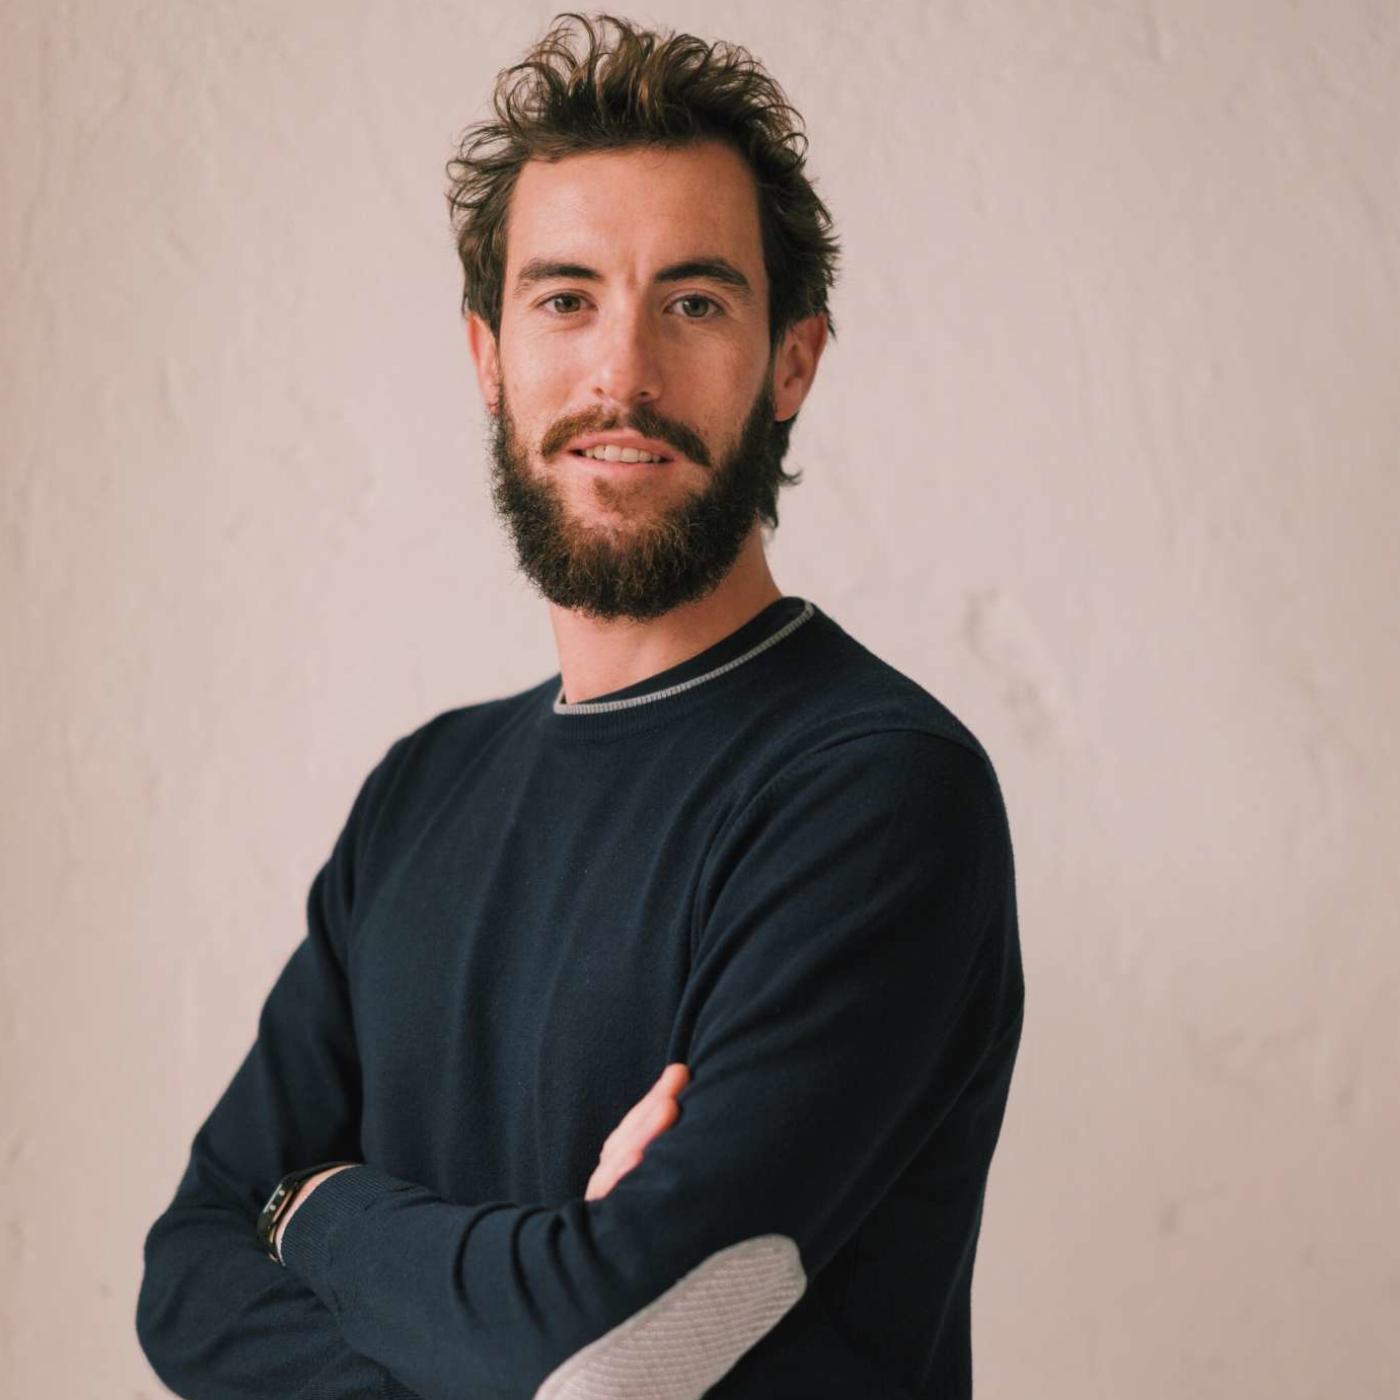 Marco Mascheroni